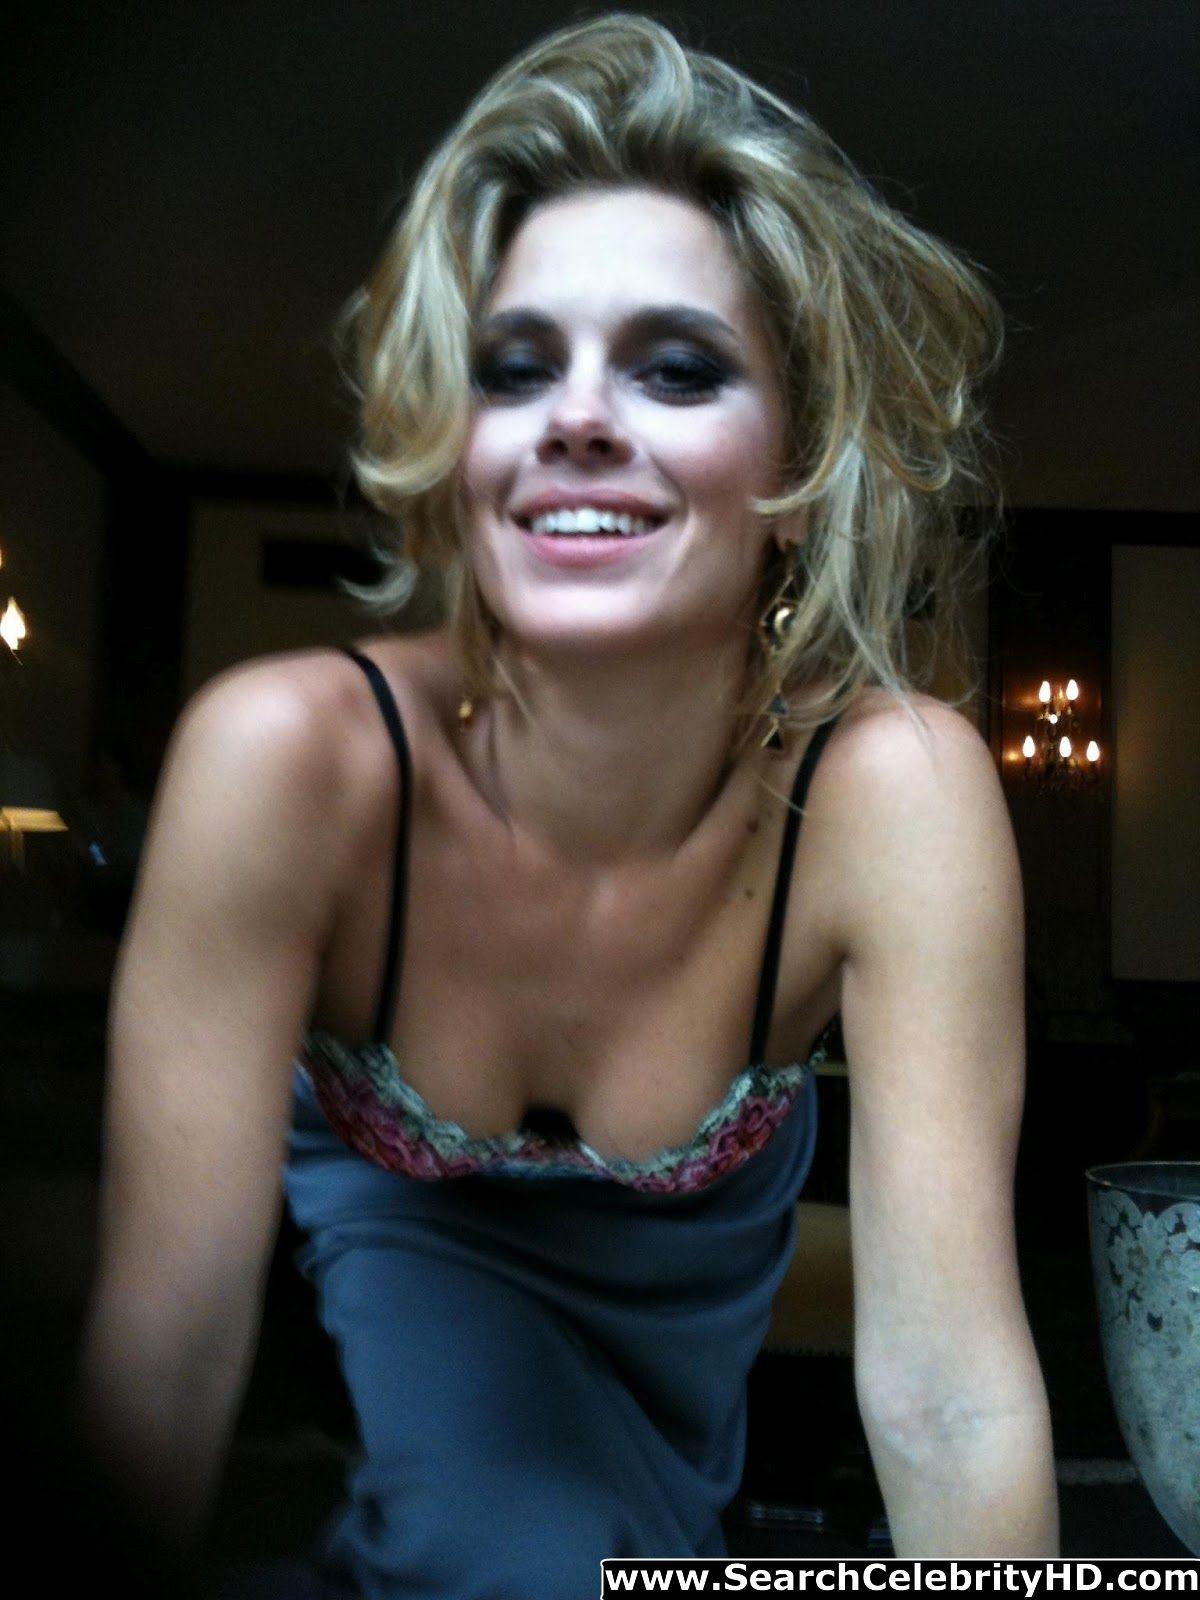 Fresh Celebrity Pics Carolina Dieckmann Leaked Nude Photo -1049